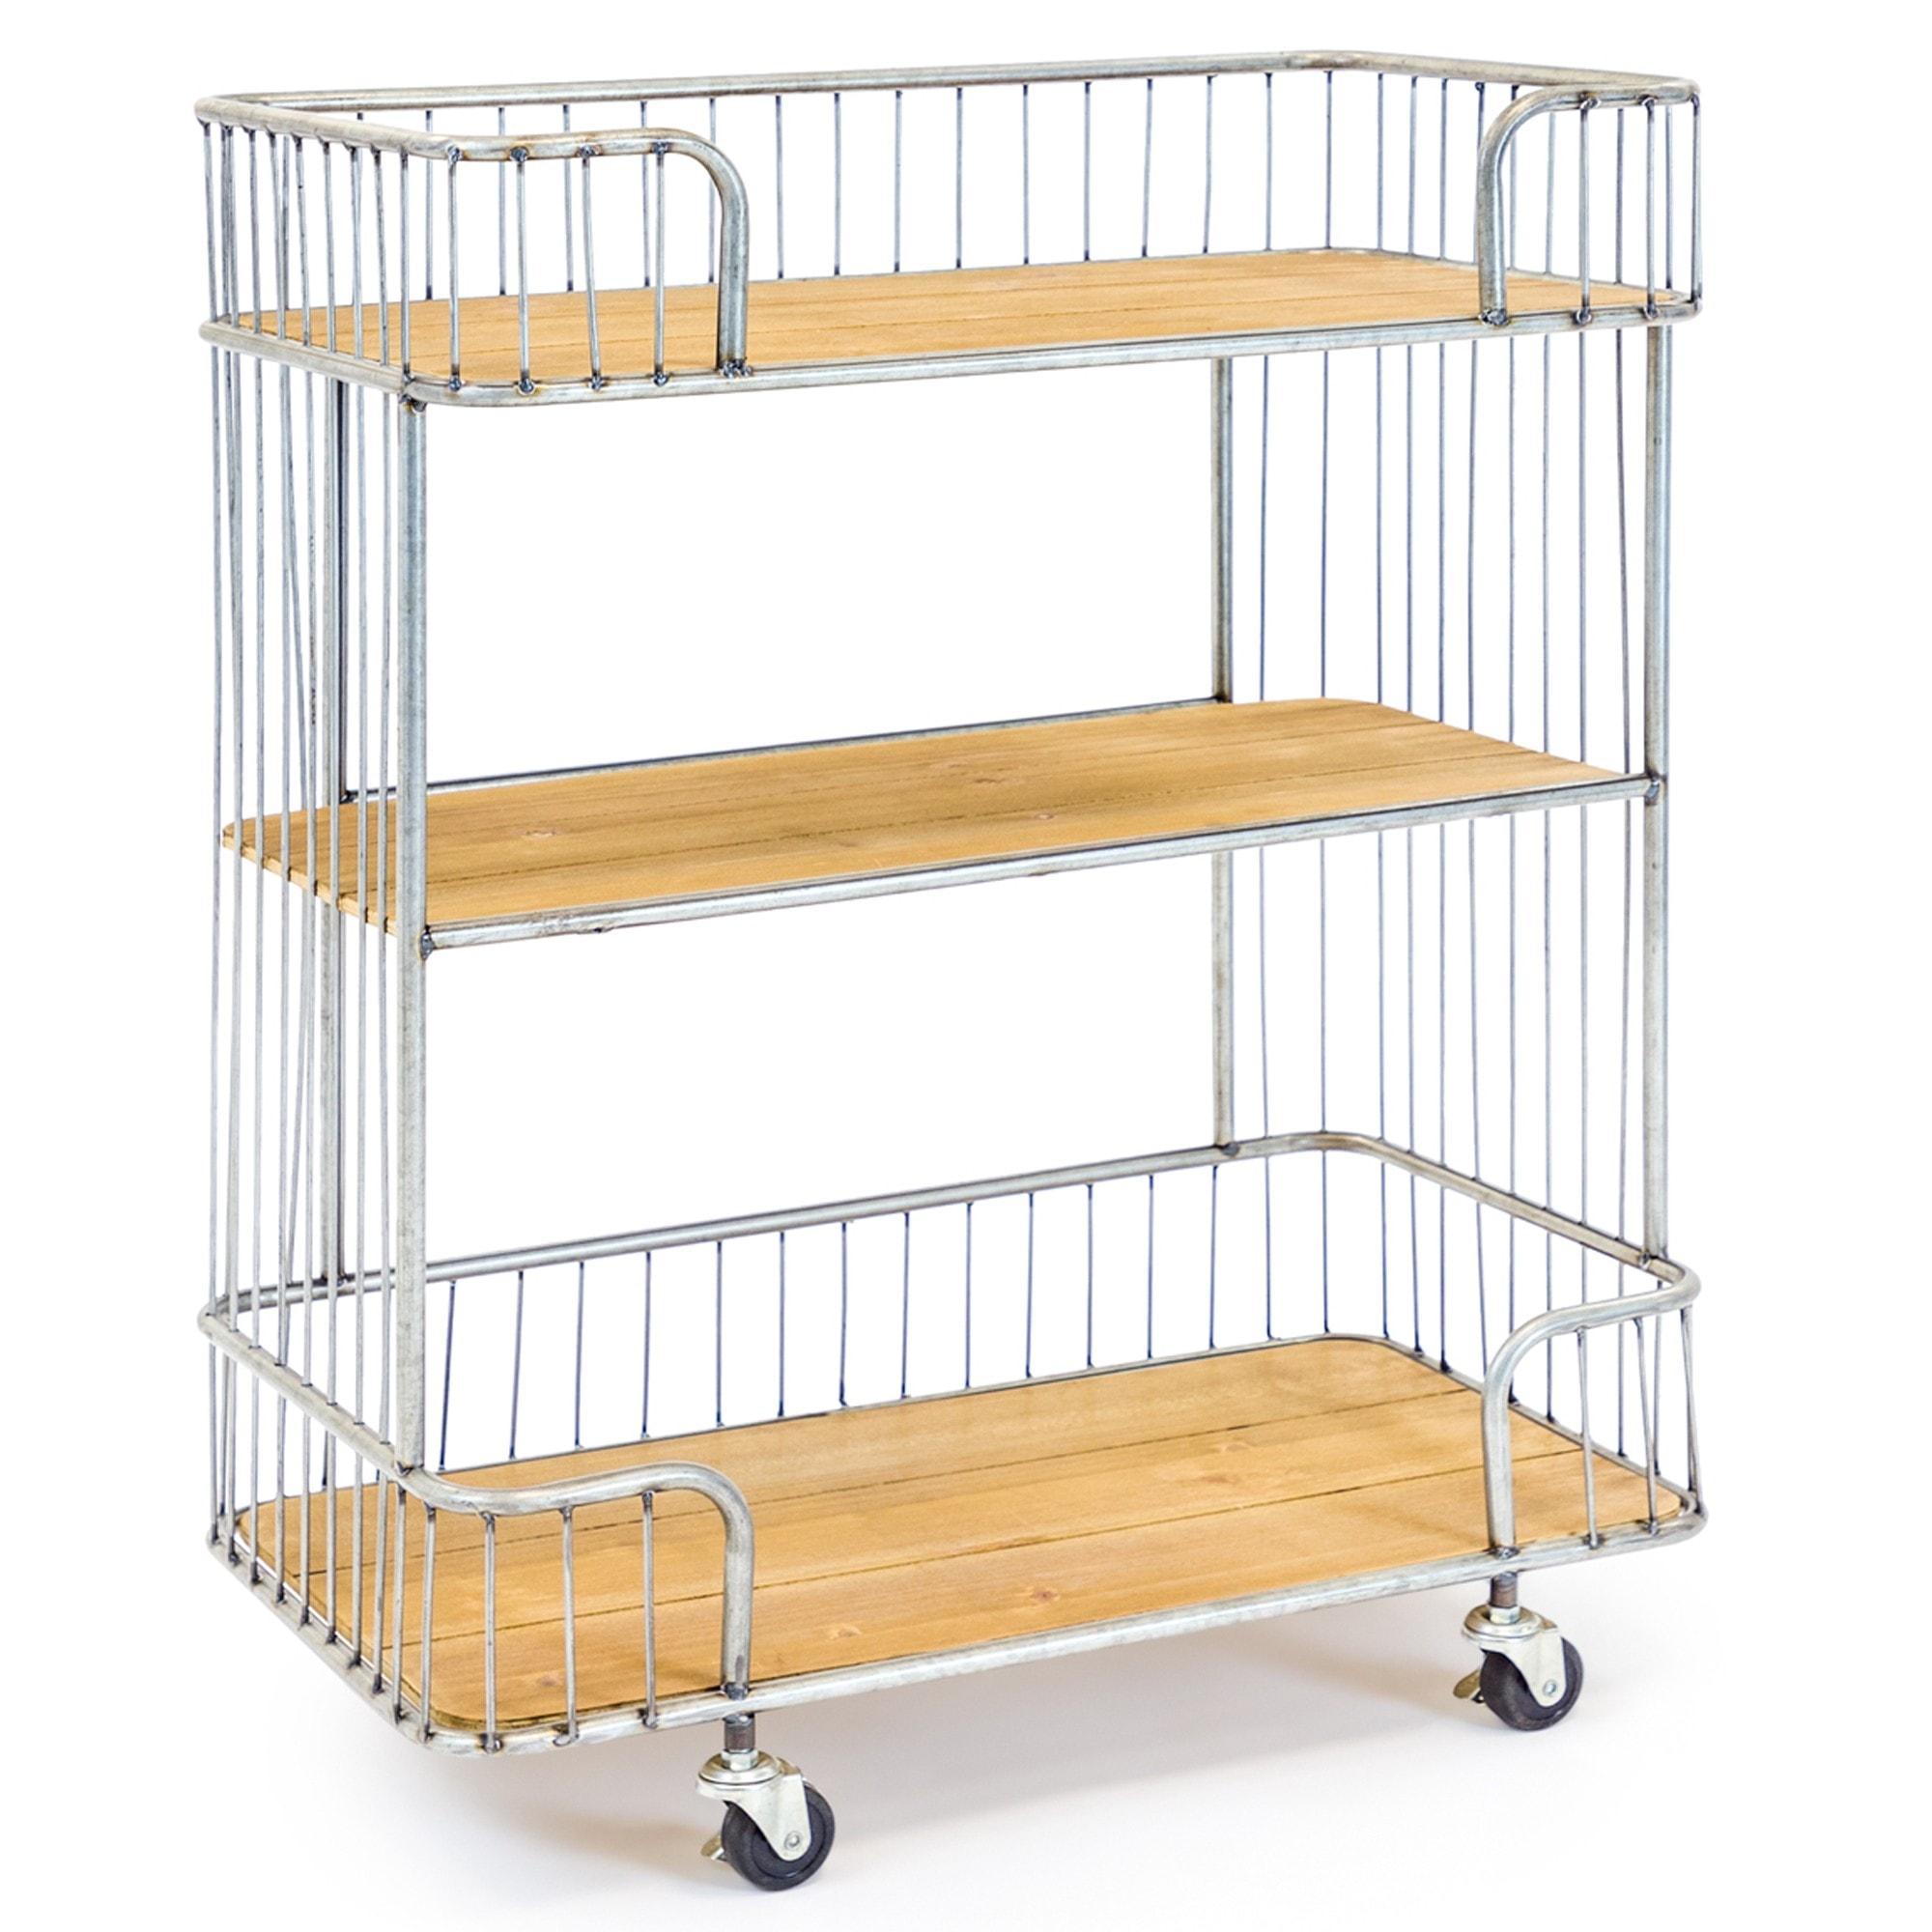 Antiqued Metal And Wood Shelving Unit Bar Cart Portable Shelving